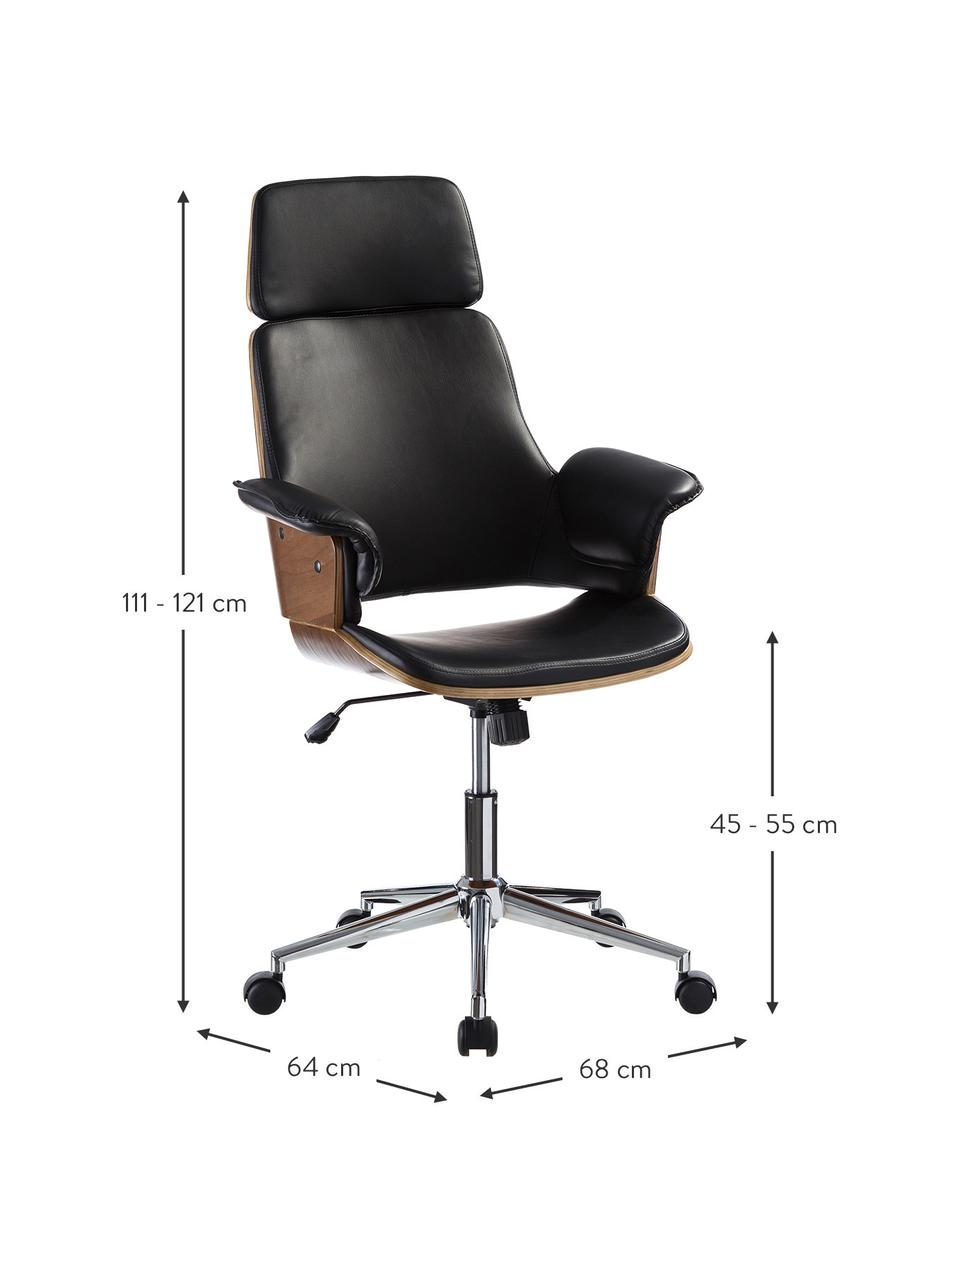 Kunstleder-Bürodrehstuhl Wheels, höhenverstellbar, Bezug: Kunstleder, Beine: Edelstahl, Sitzschale: Holz, Schwarz, B 68 x T 64 cm